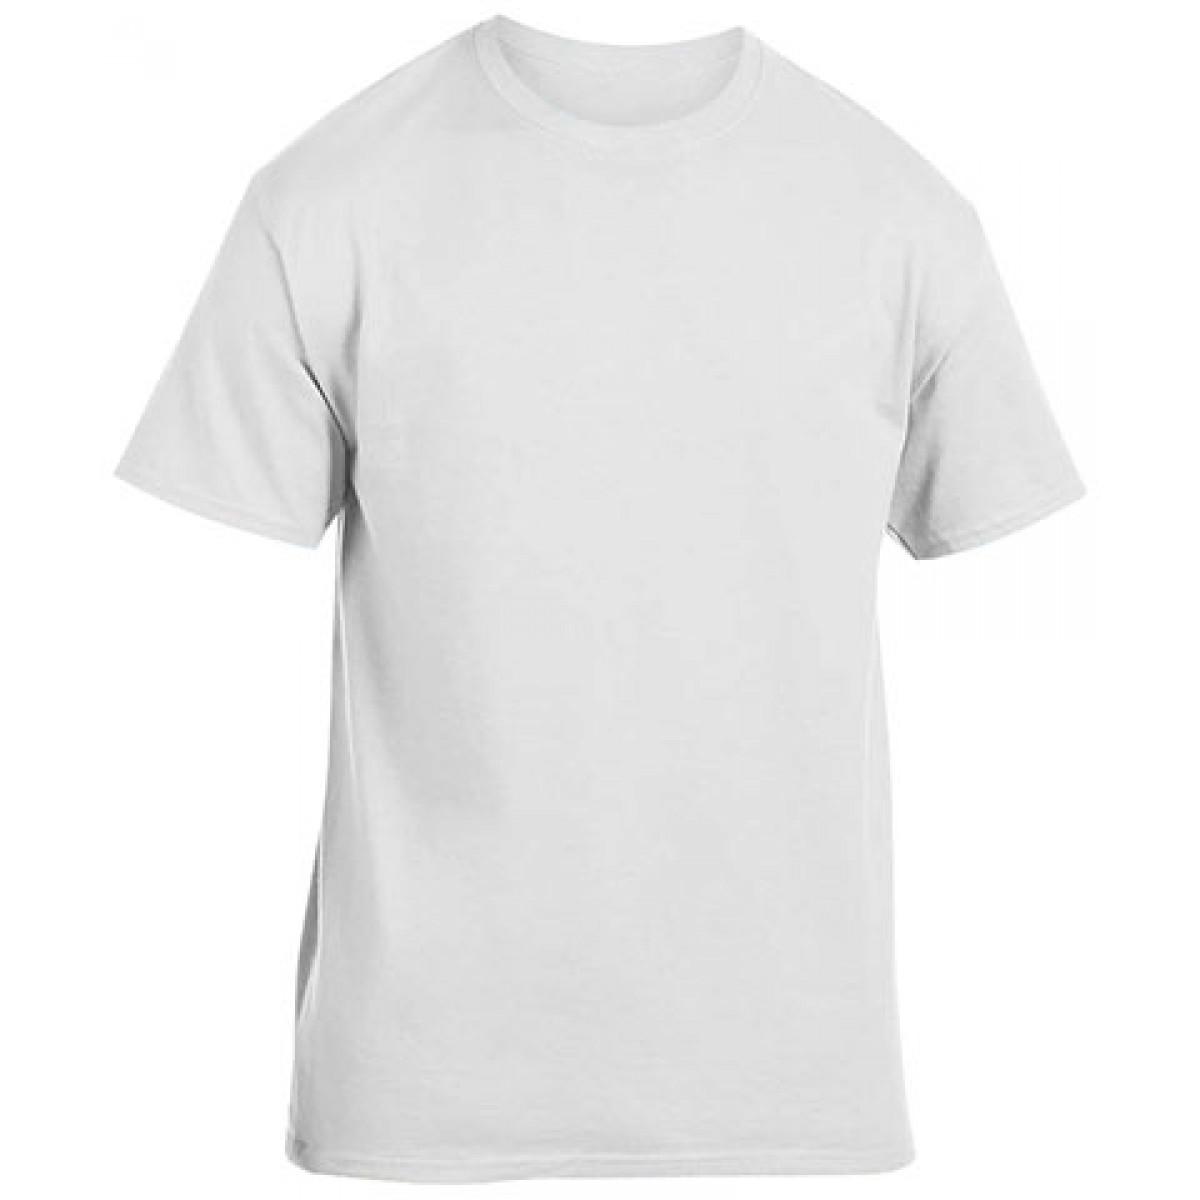 Heavy Cotton Activewear T-Shirt-White-M